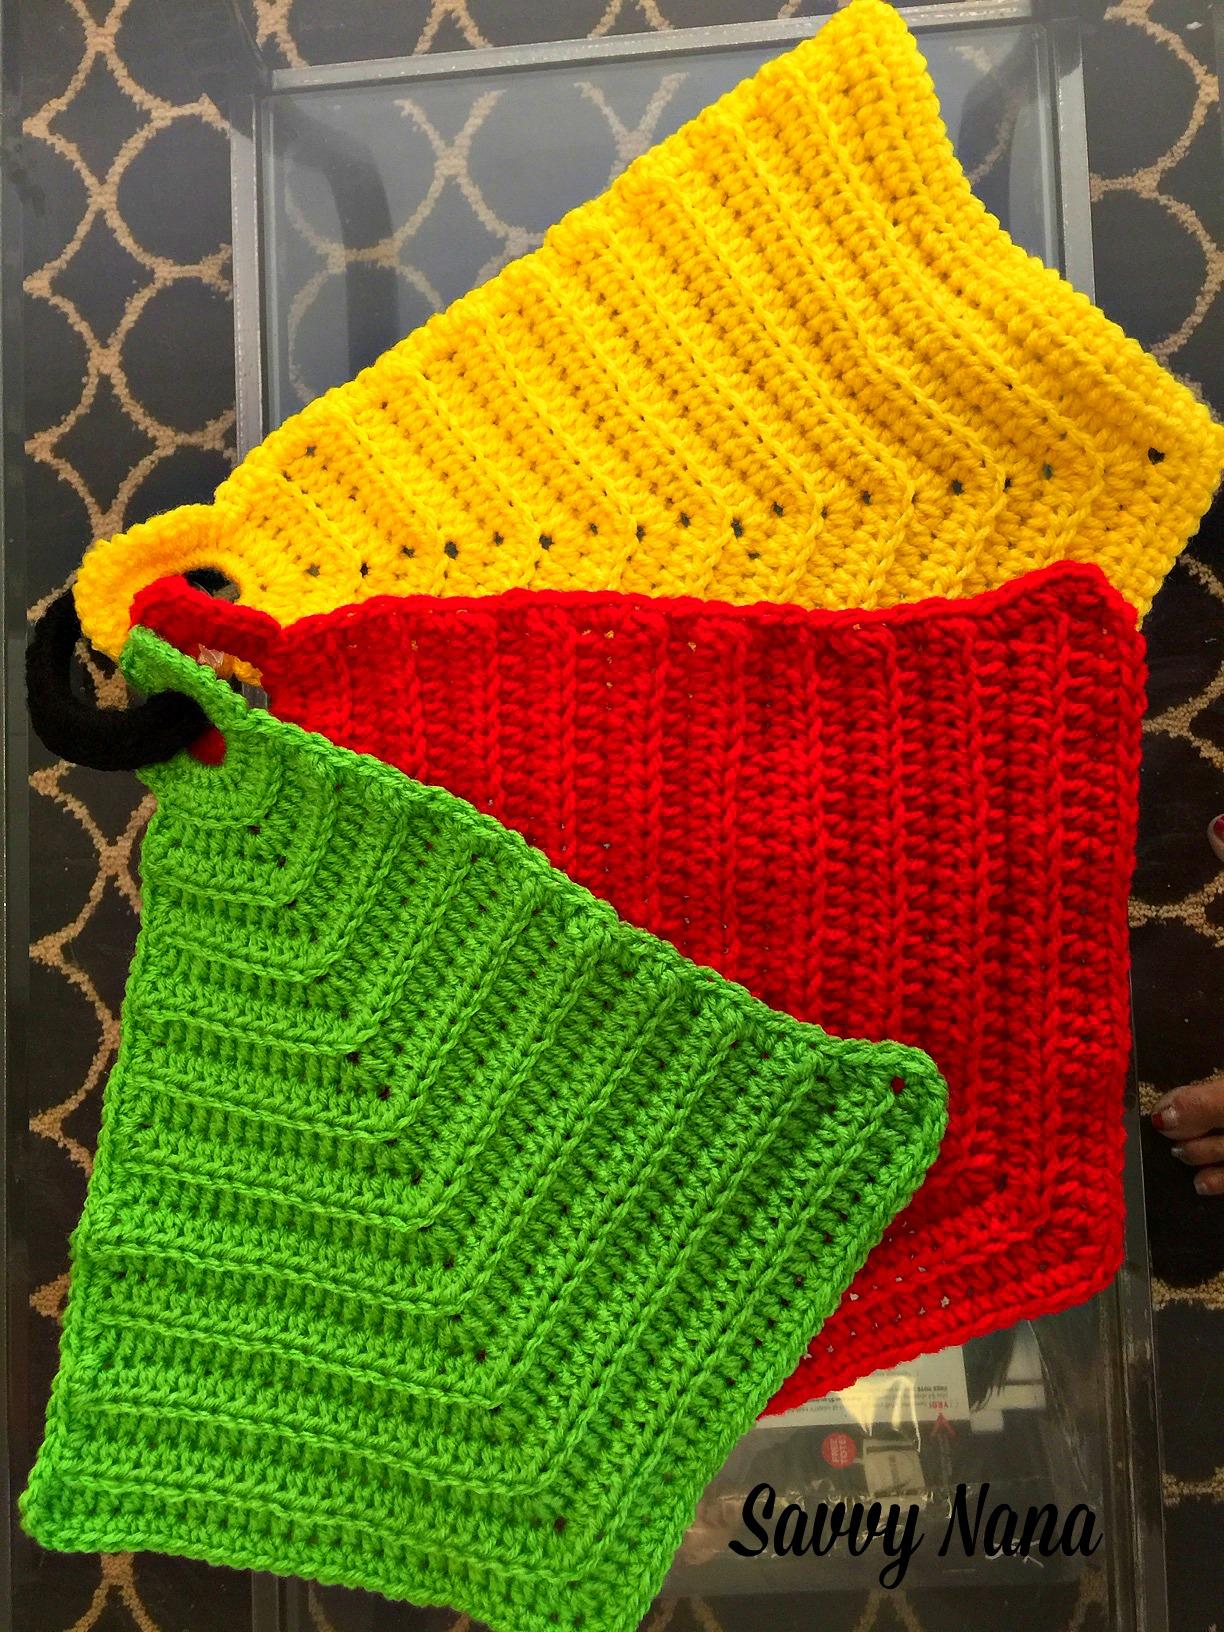 Crochet Trivets Hot Pads Crocheted Kitchen Hot Pads Free Crochet Pattern Savvy Nana